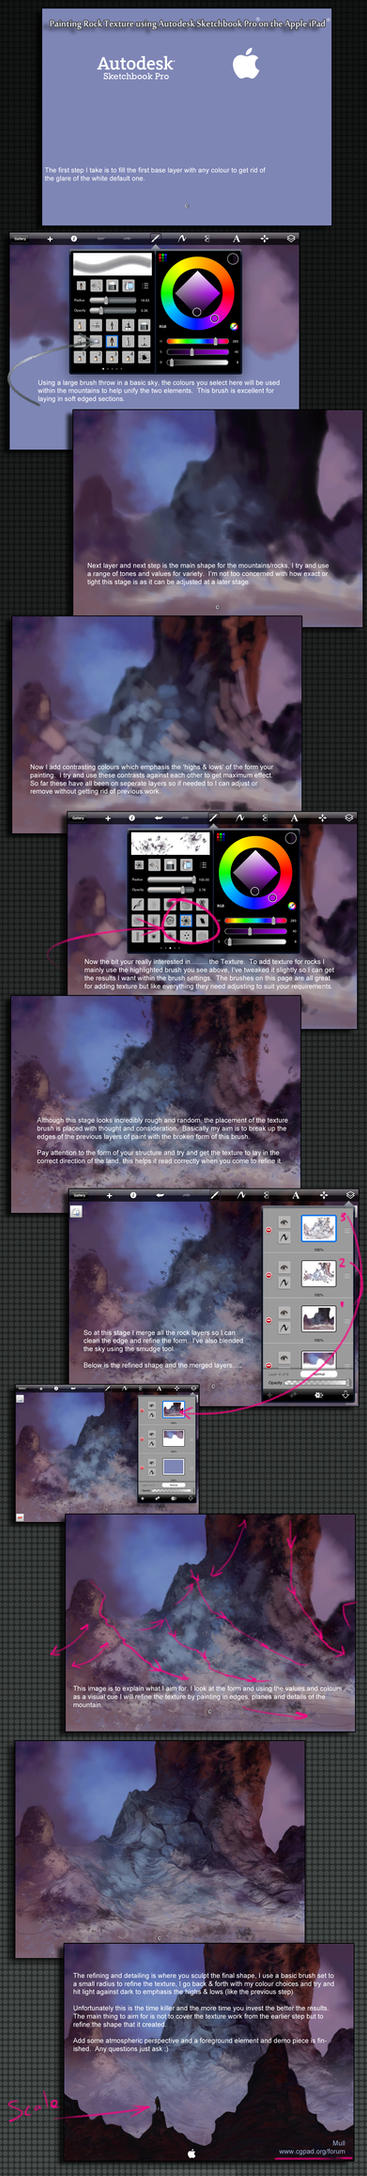 iPad  Sketchbook Pro Tutorial by Mull-Art